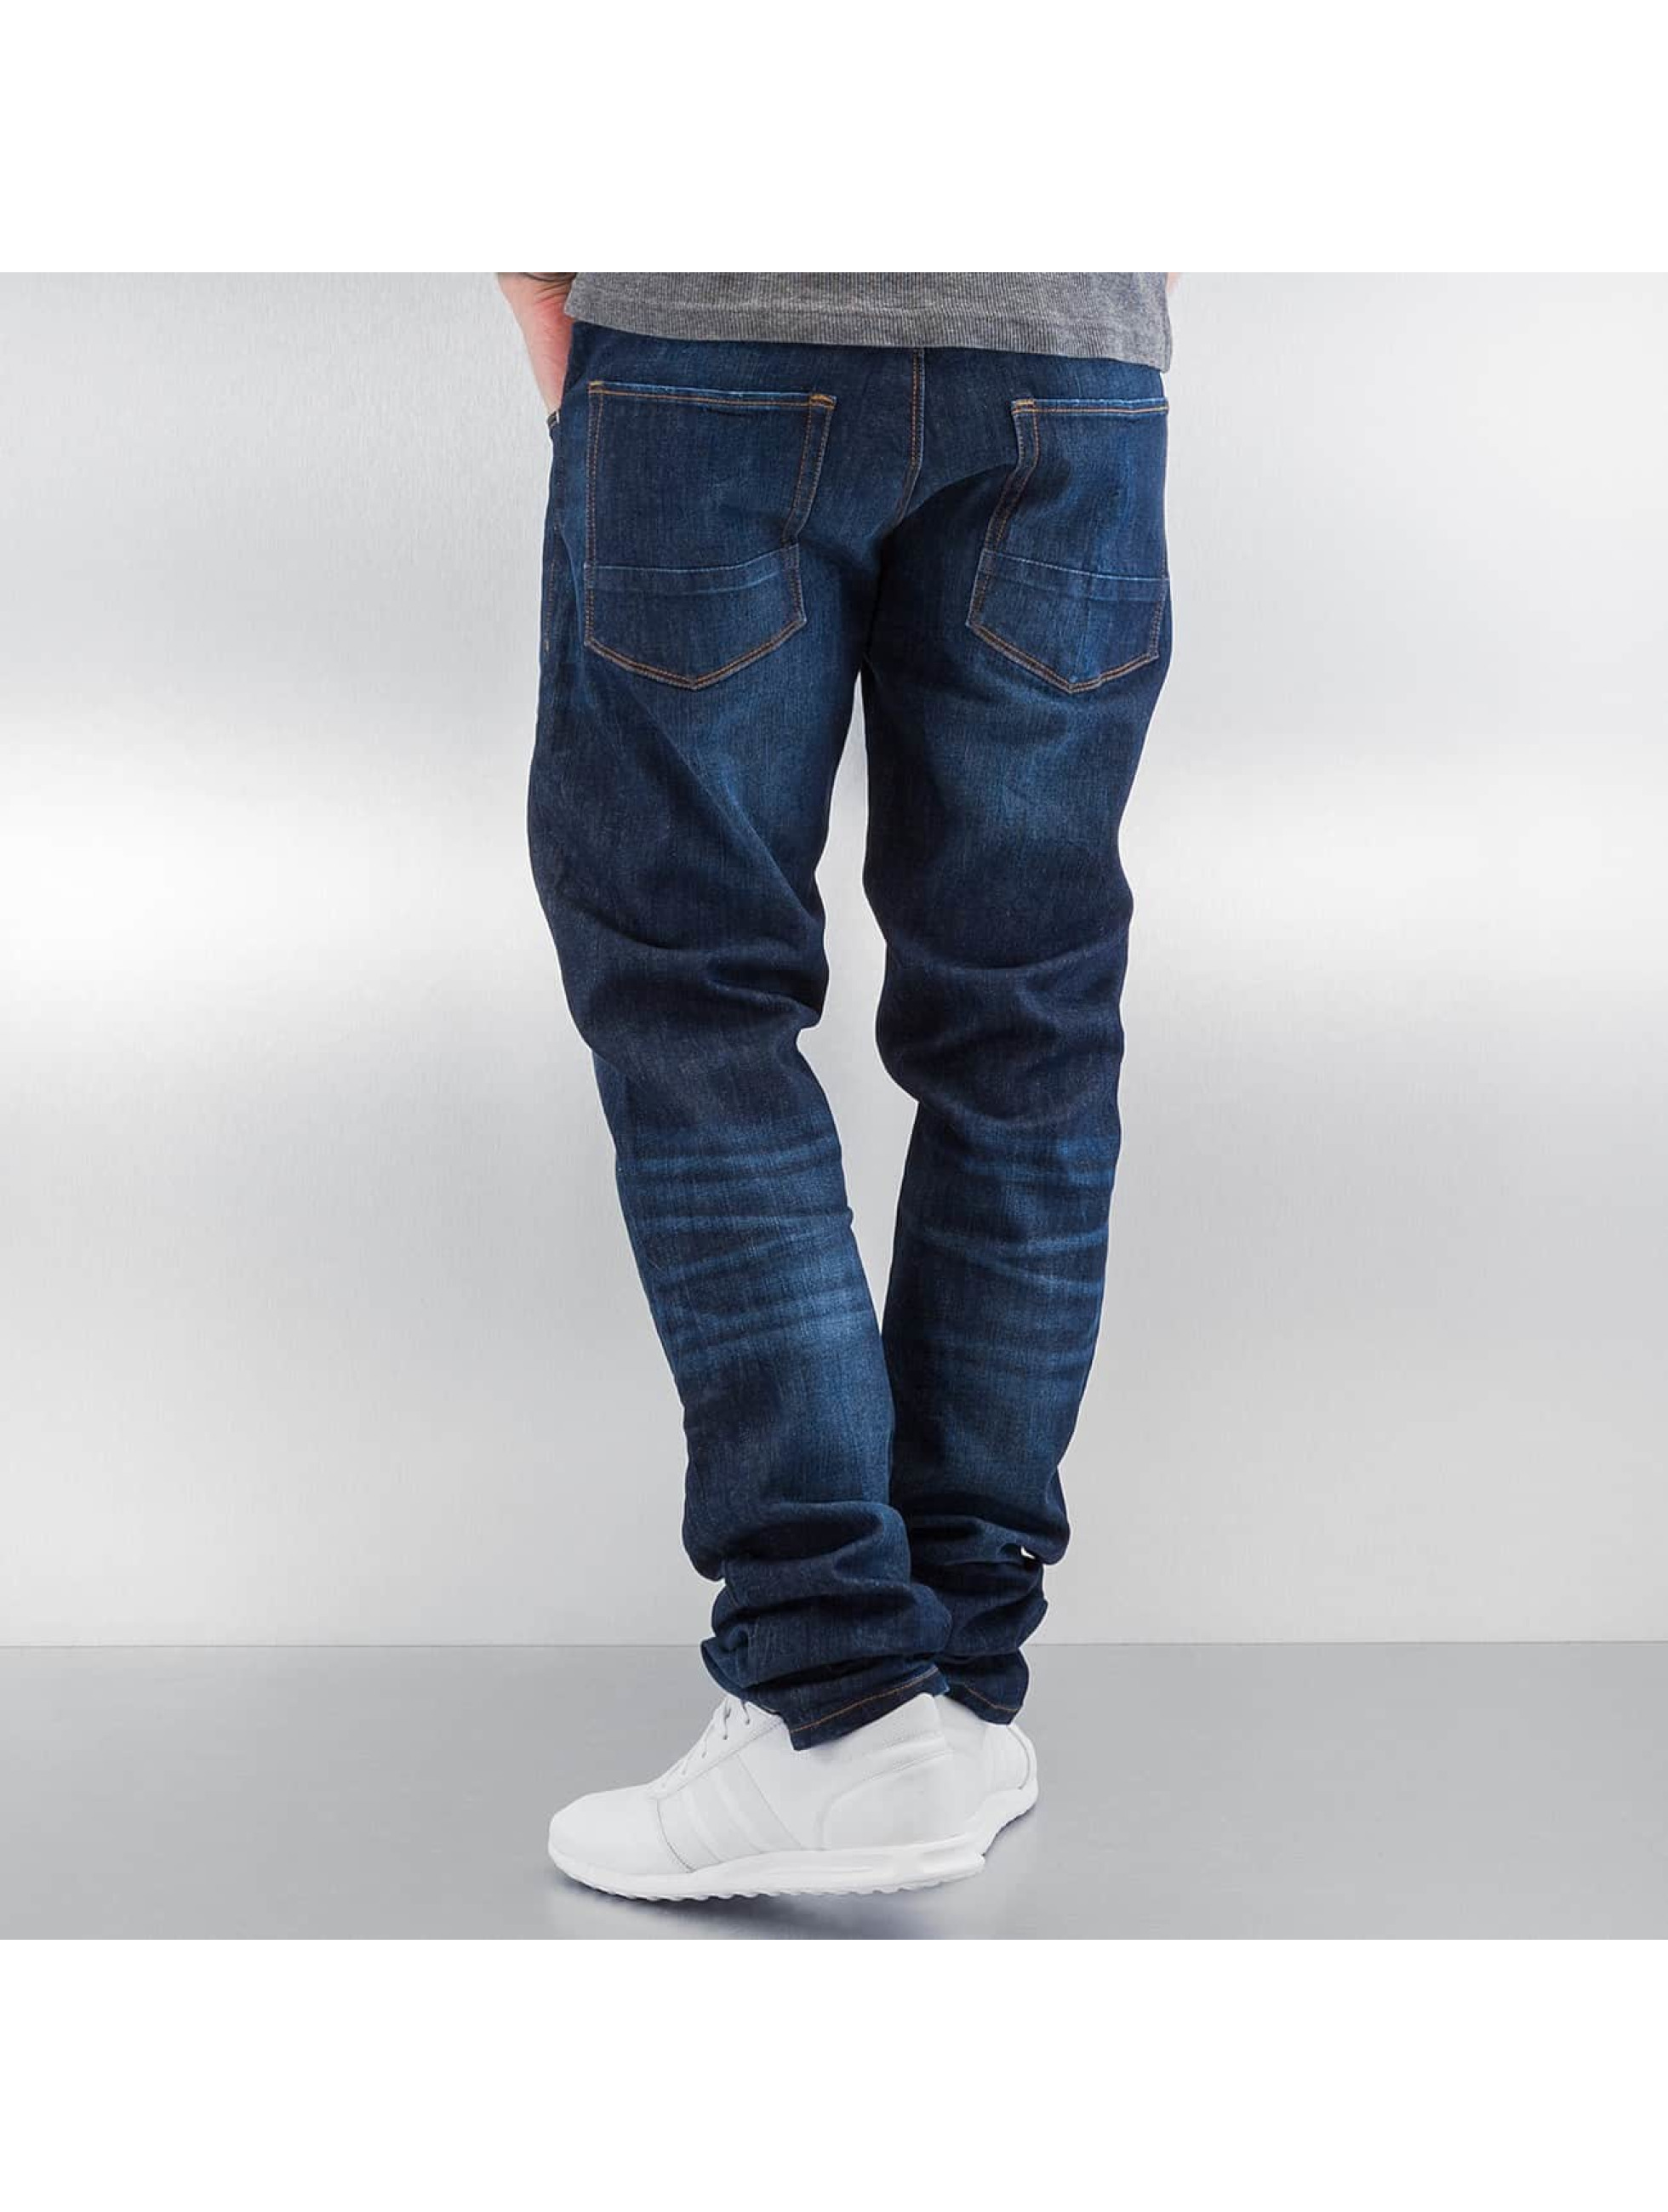 SHINE Original Dżinsy straight fit Slim niebieski